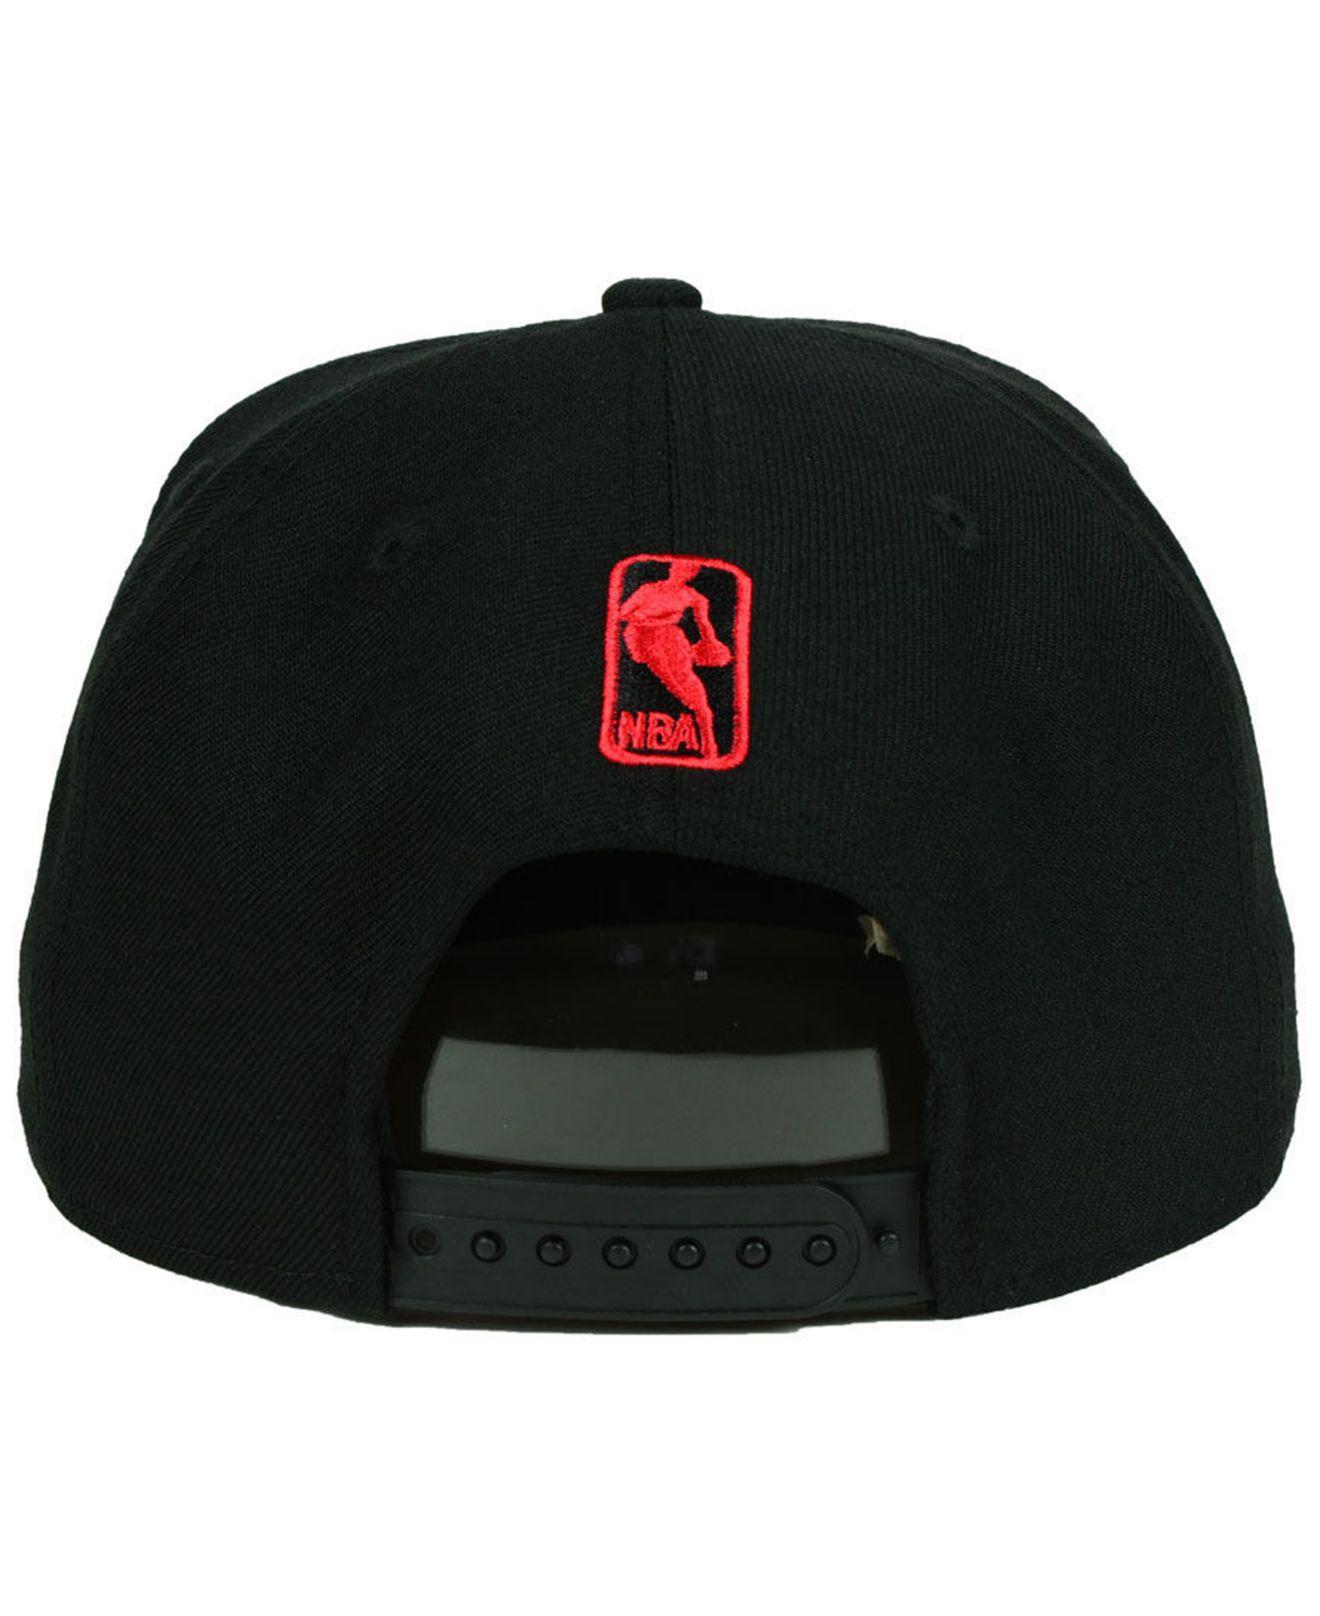 separation shoes b2331 99a0d ... sale washington wizards combo logo 9fifty snapback cap for men lyst.  view fullscreen 555c9 b3cca